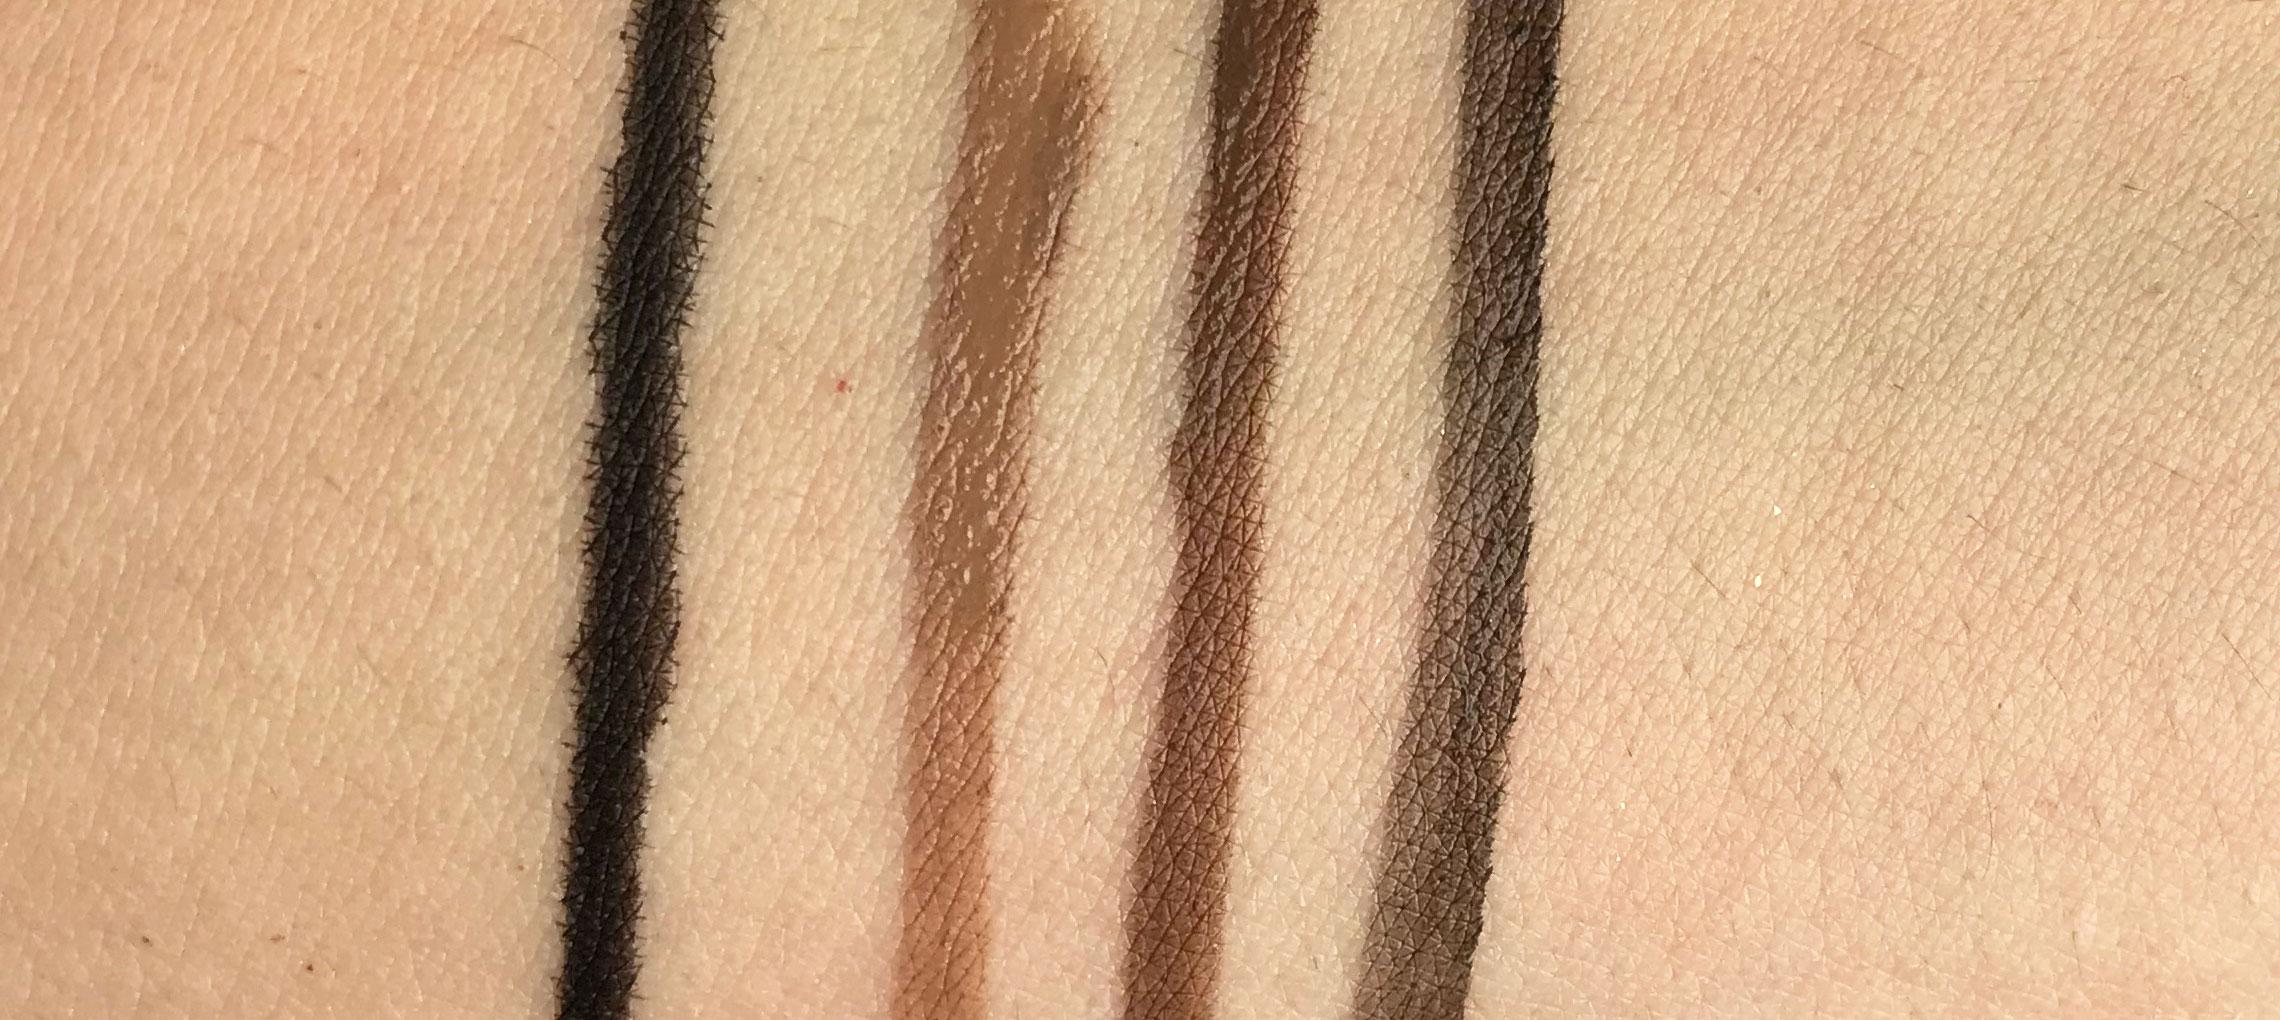 L'Oreal Paris x Camila Cabello Havana Eye Shadow by L'Oreal #9